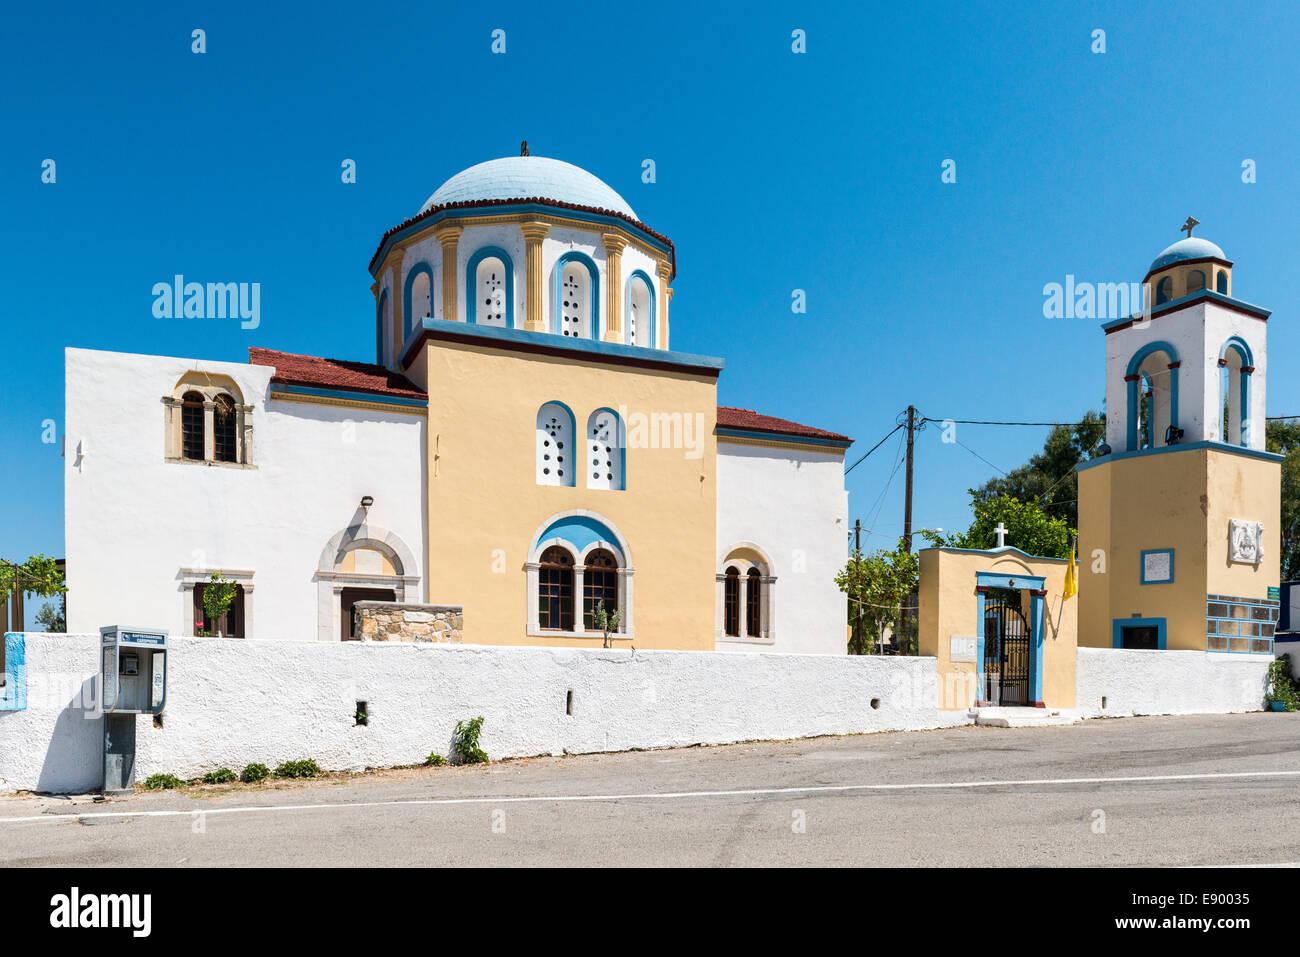 Saint Nikolaos Church in Pyli, Kos, Greece - Stock Image